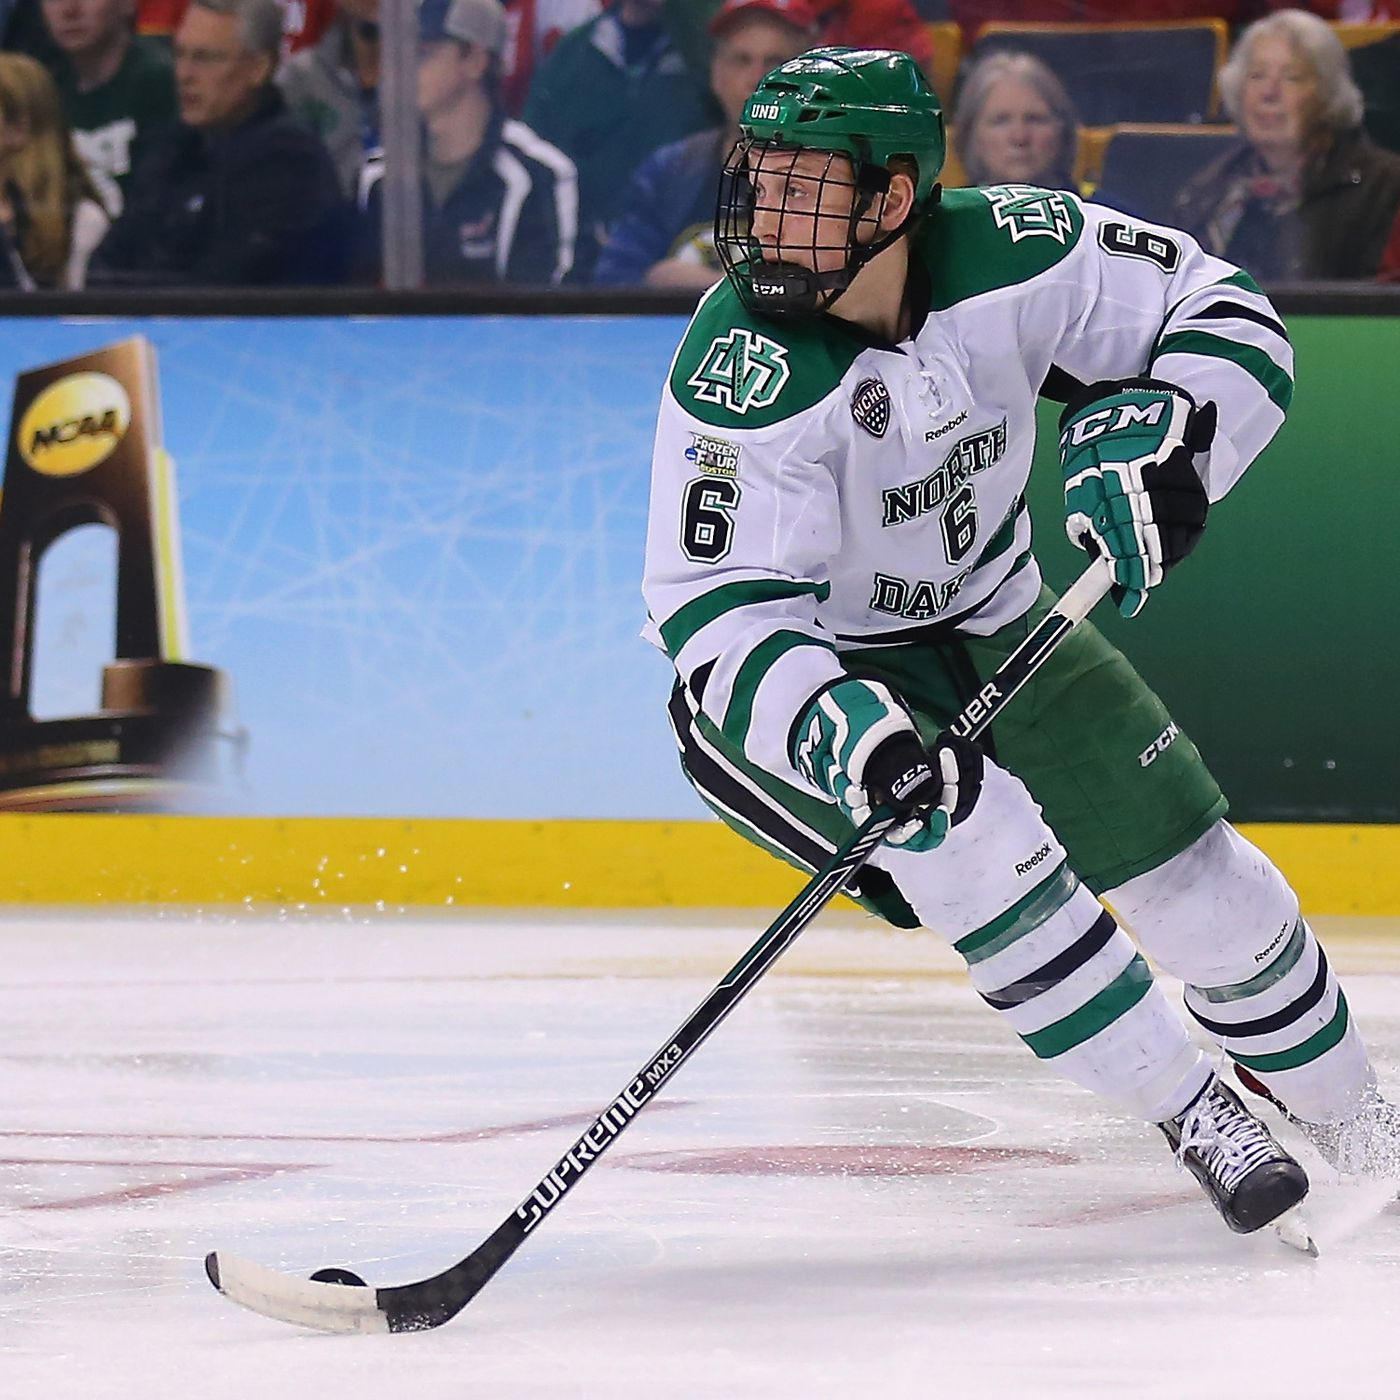 College hockey frozen four betting odds tcu smu betting line